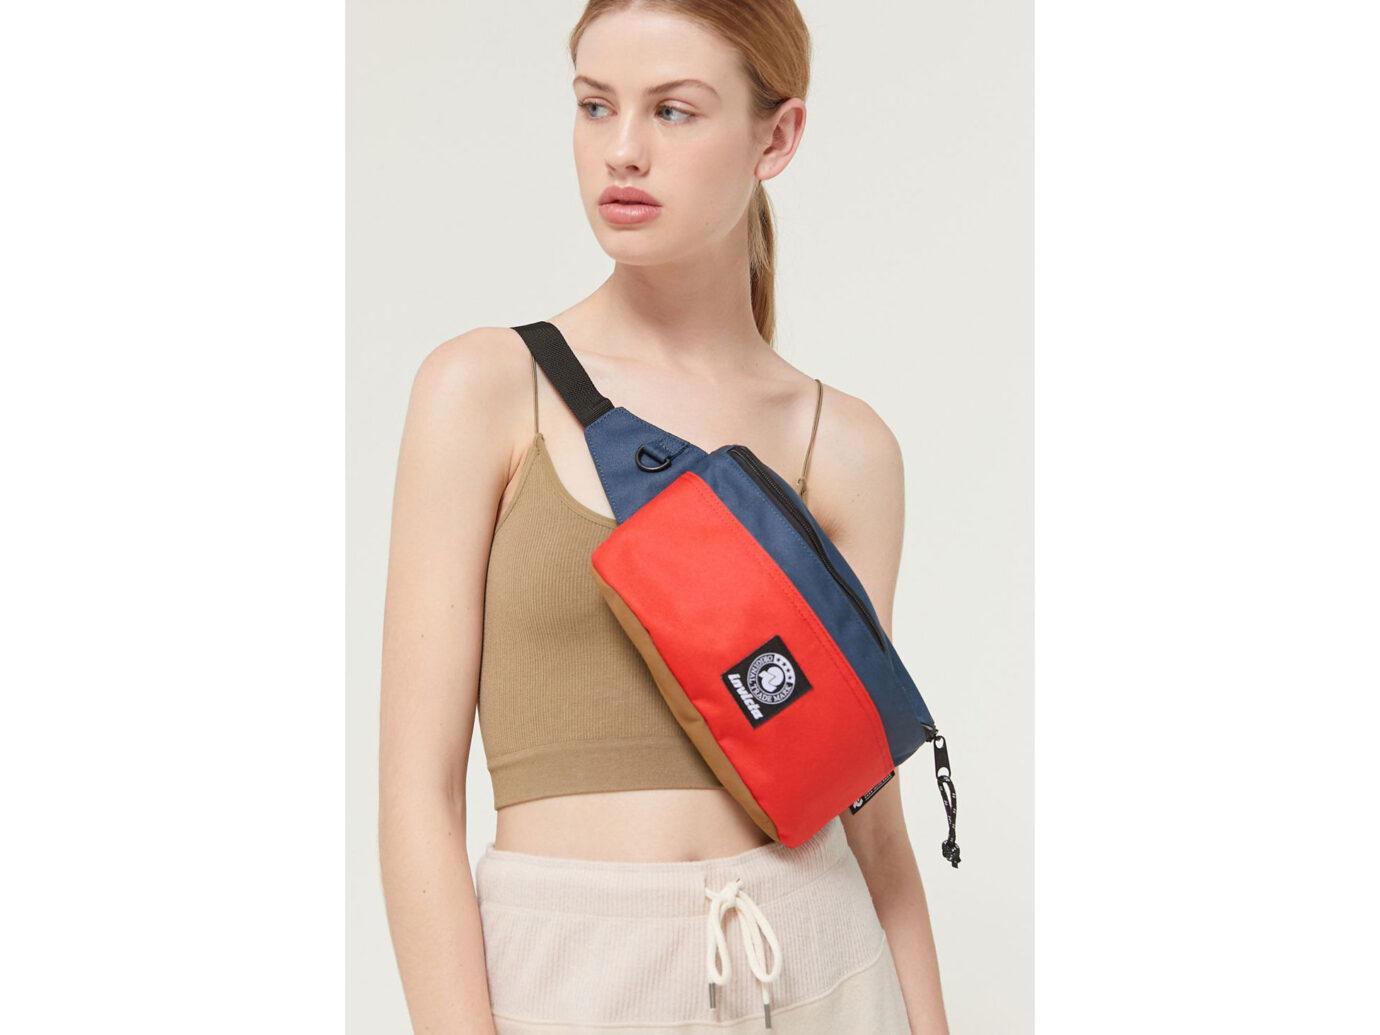 Invicta 25 Belt Bag